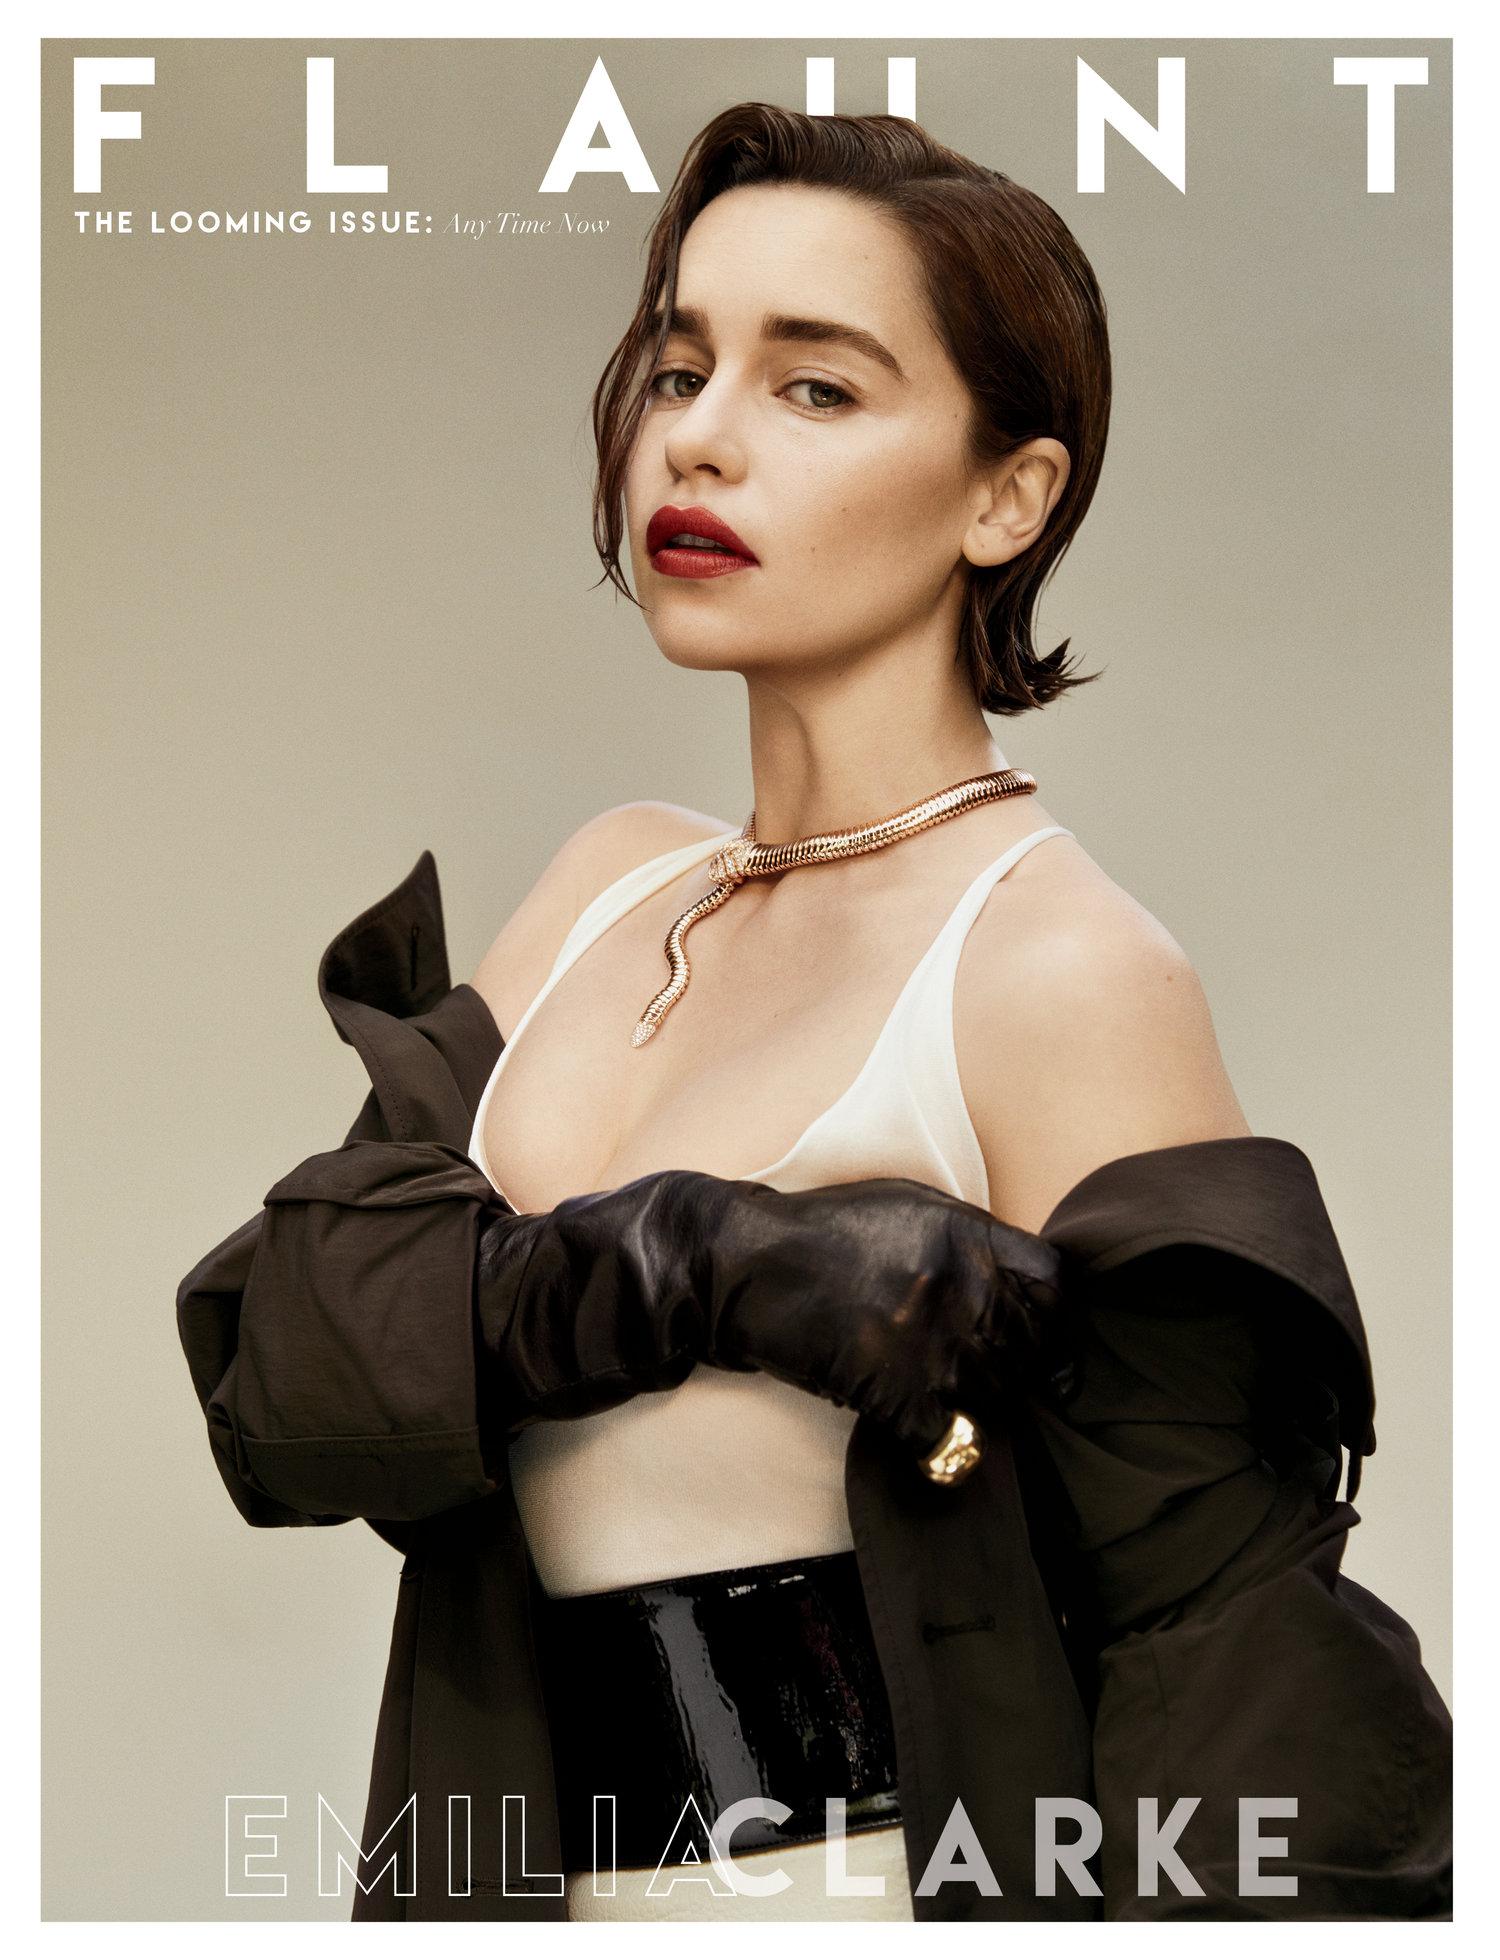 2019-05-00_Flaunt_Emilia Clarke_Cover.jpg